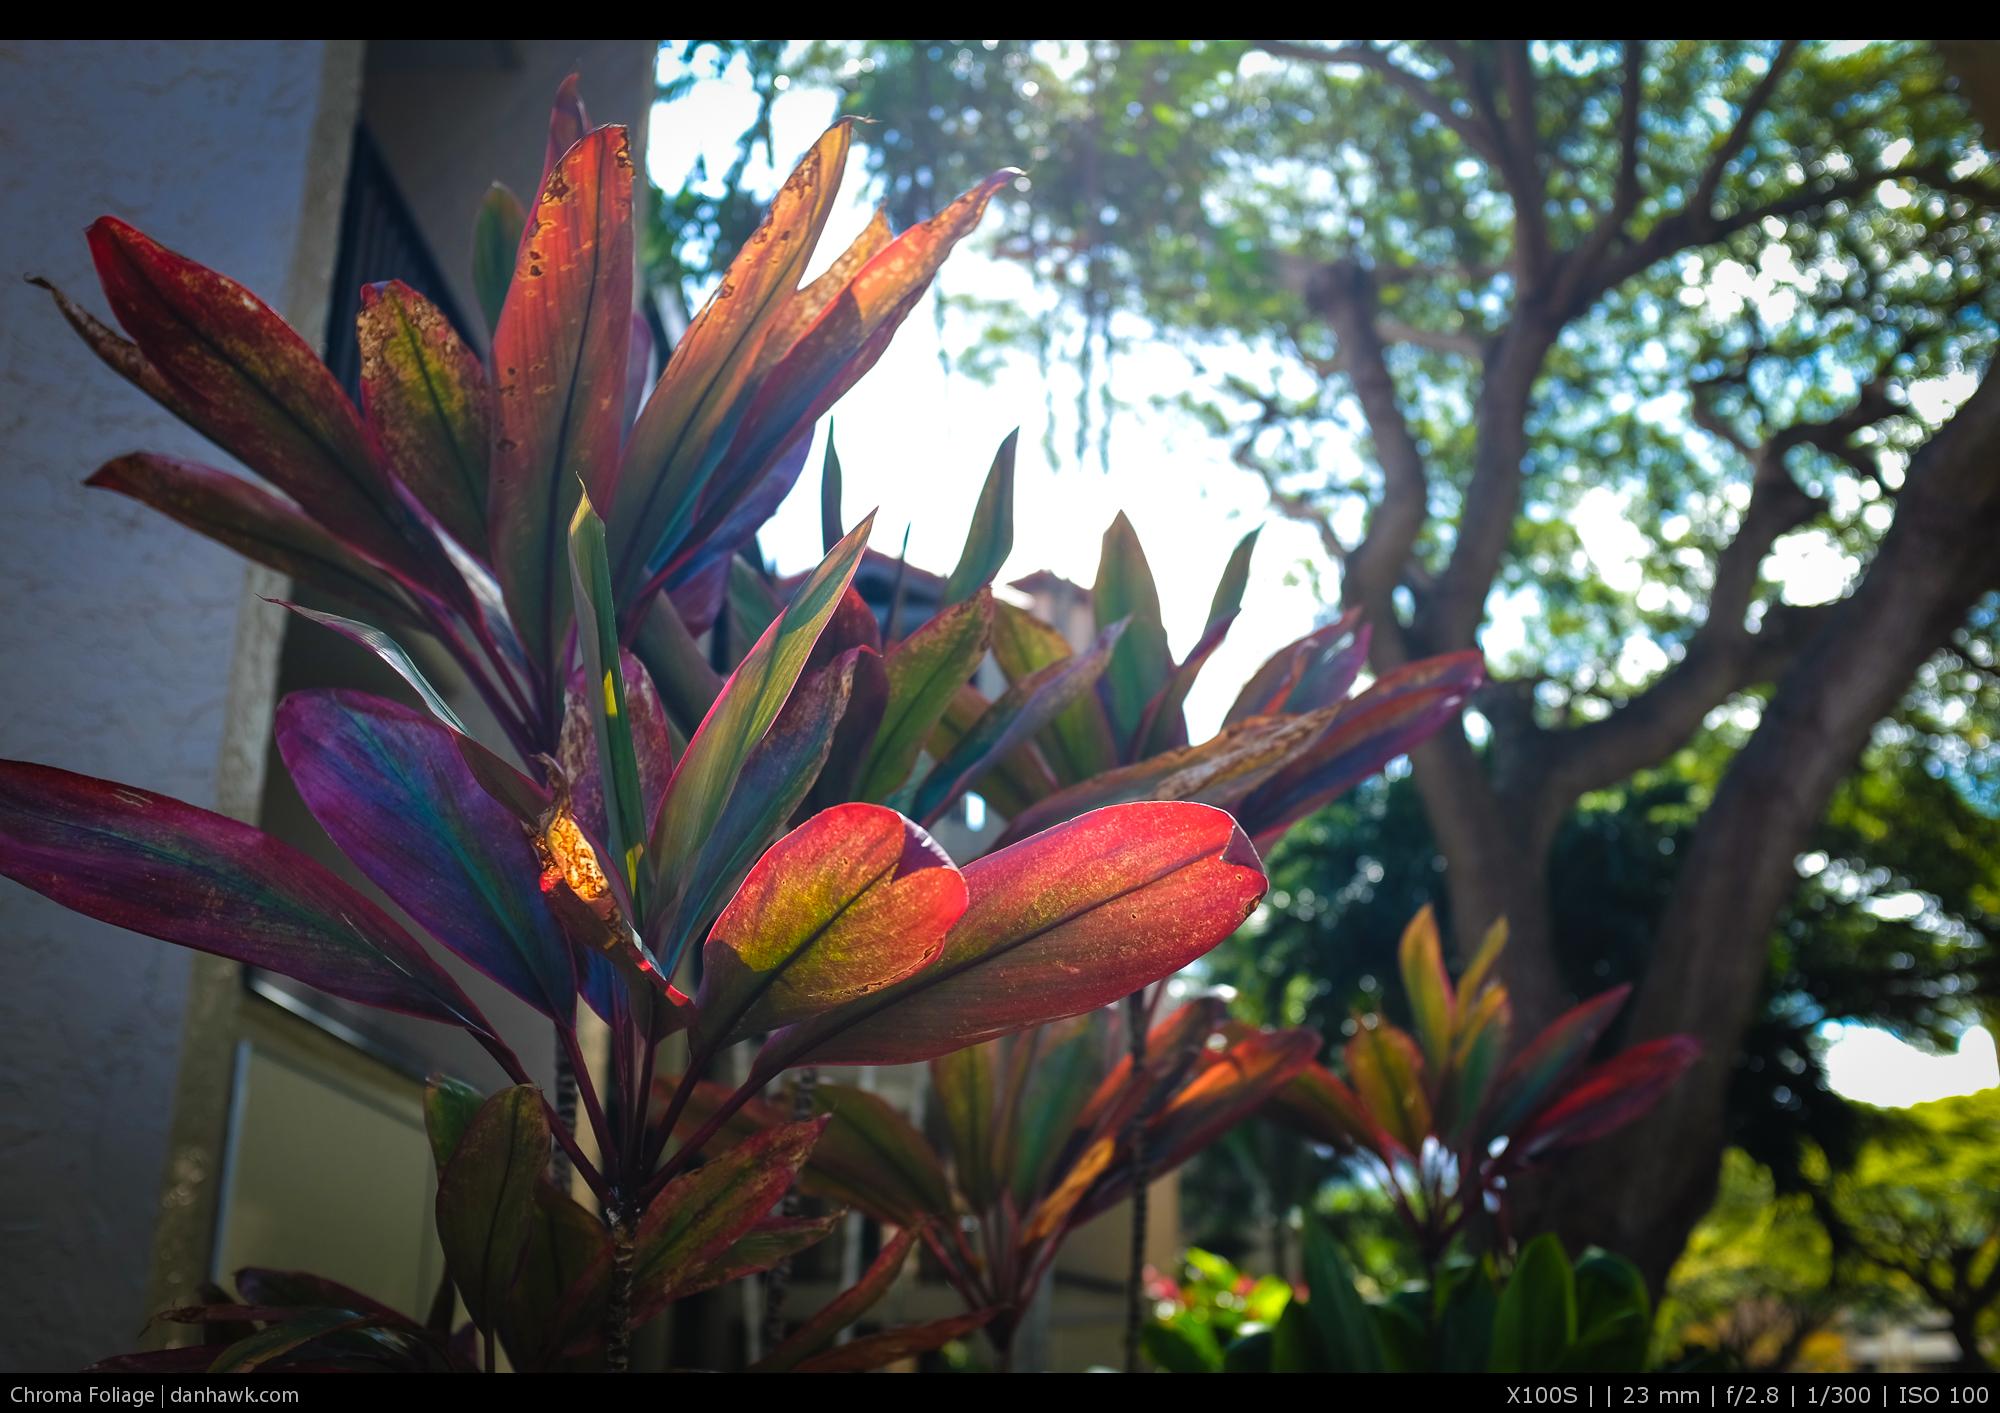 Chroma Foliage